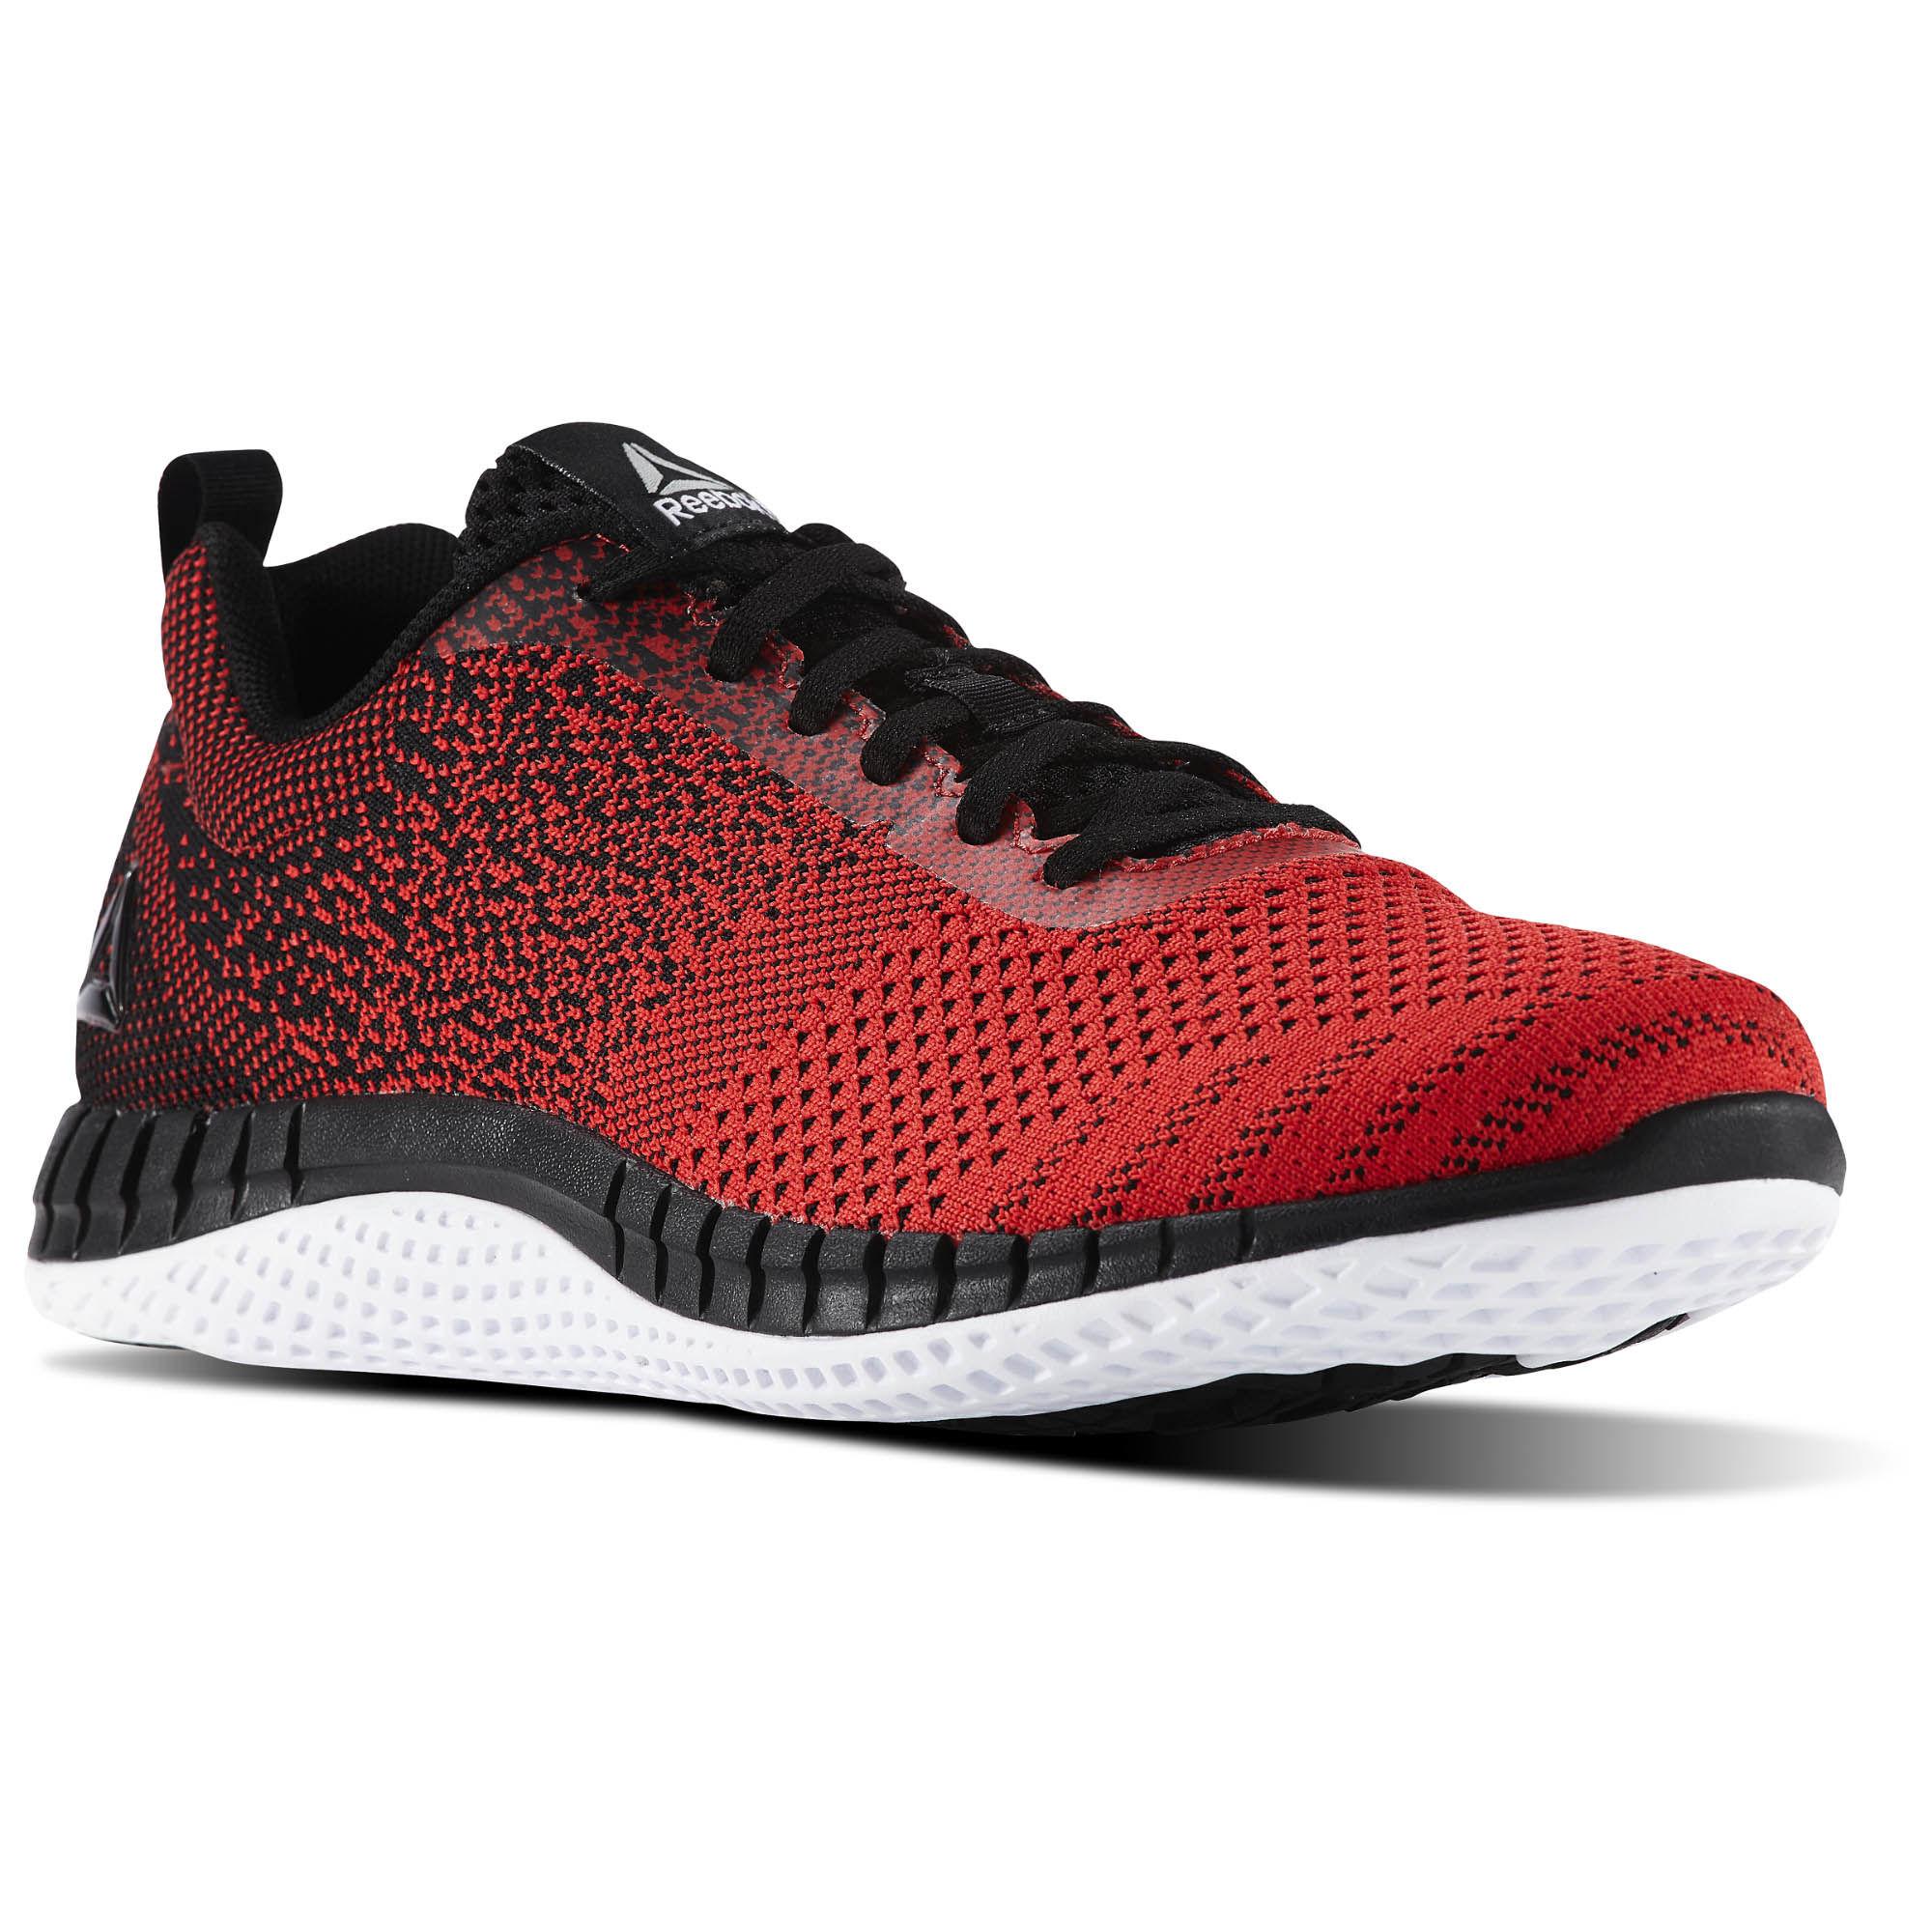 Reebok Men's Print Run Prime Ultraknit Shoes Red $34.98 + Free Shipping